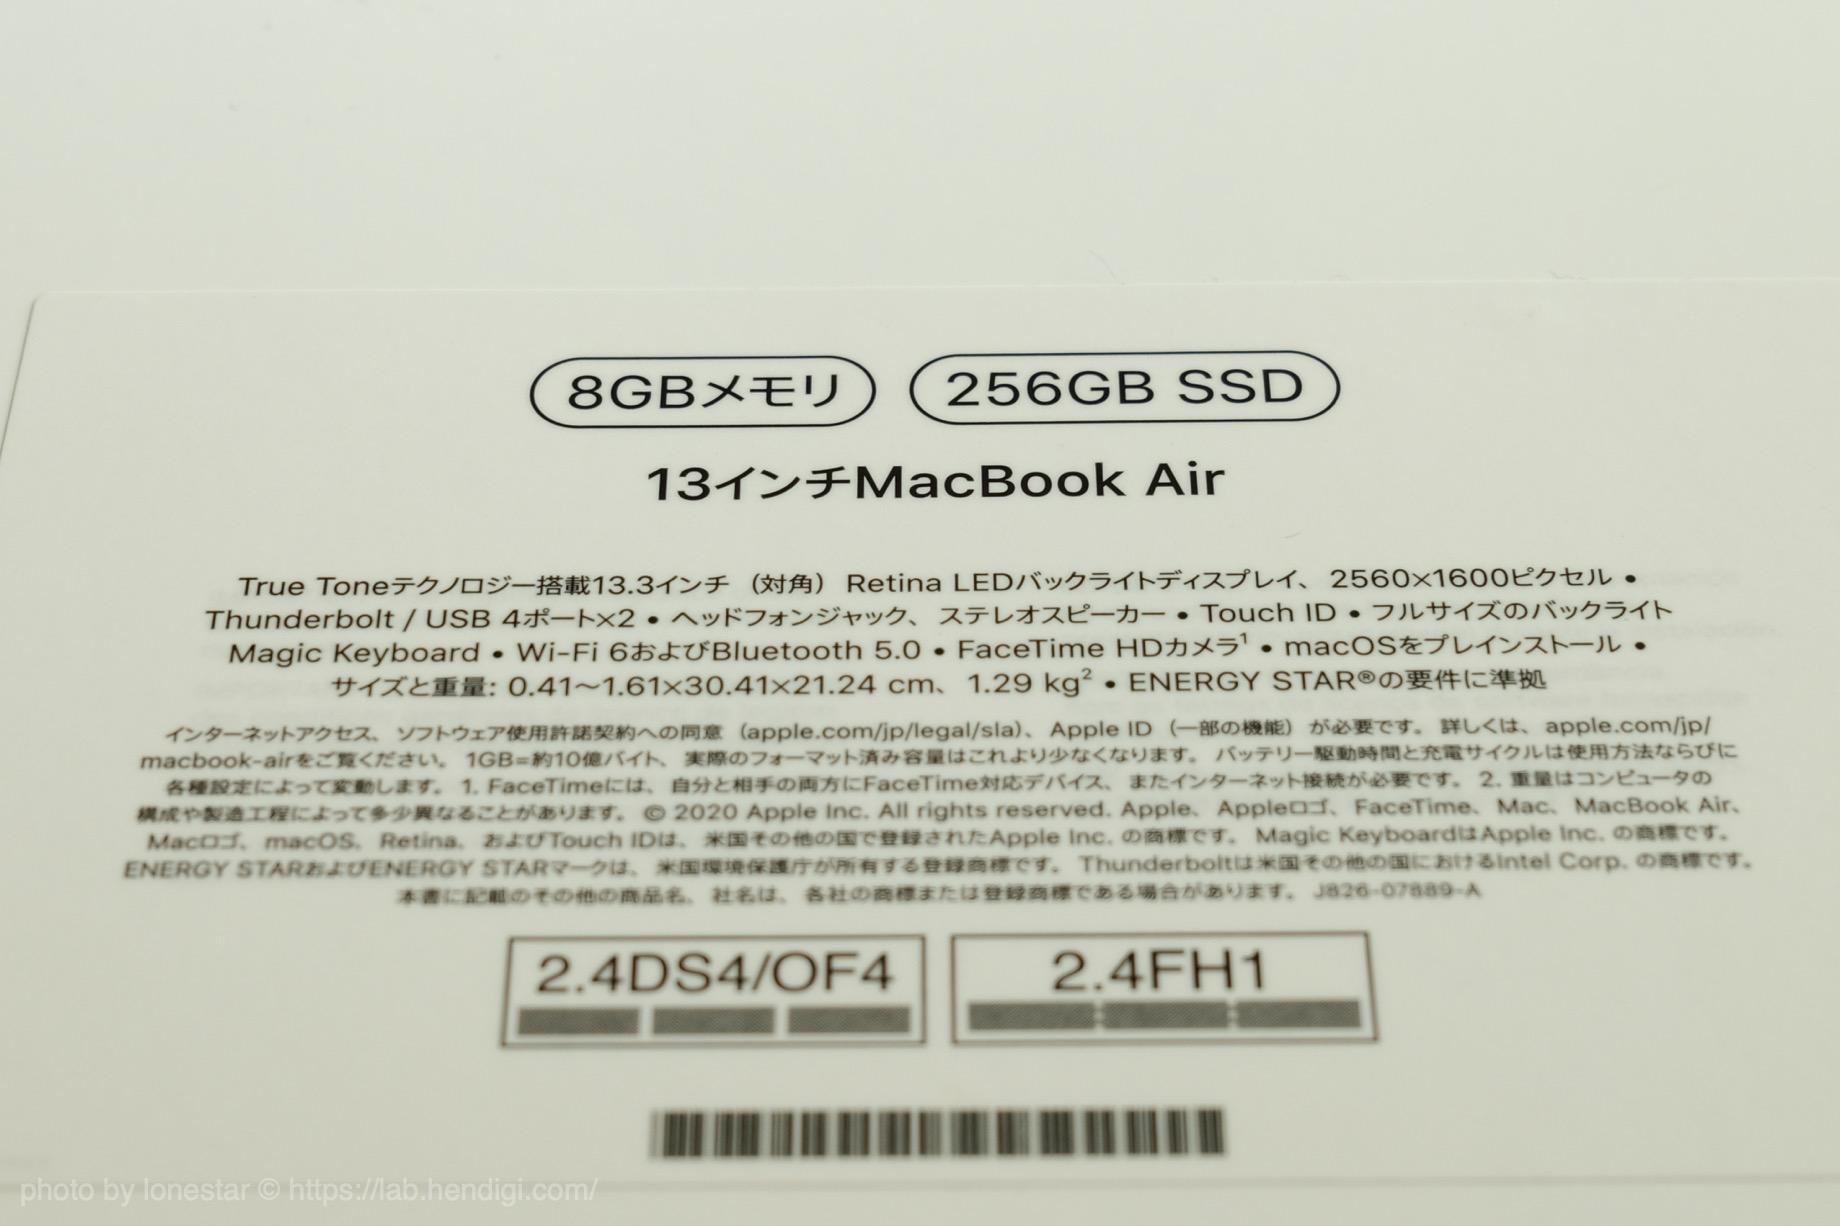 M1 MacBook Air 8GB 256GB SSD